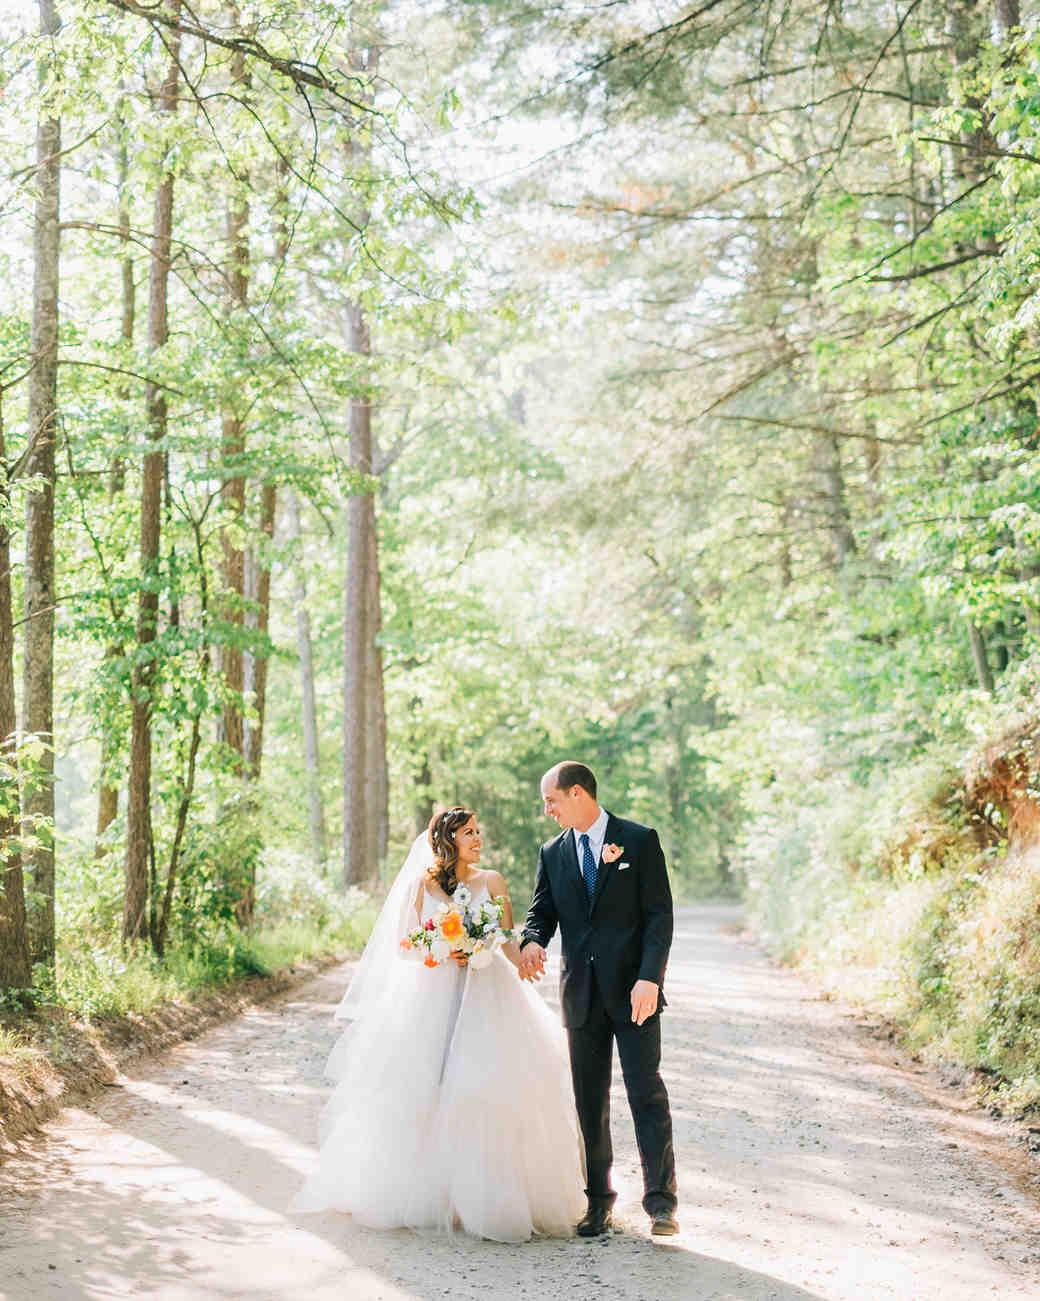 elizabeth jake georgia wedding couple walking through forest